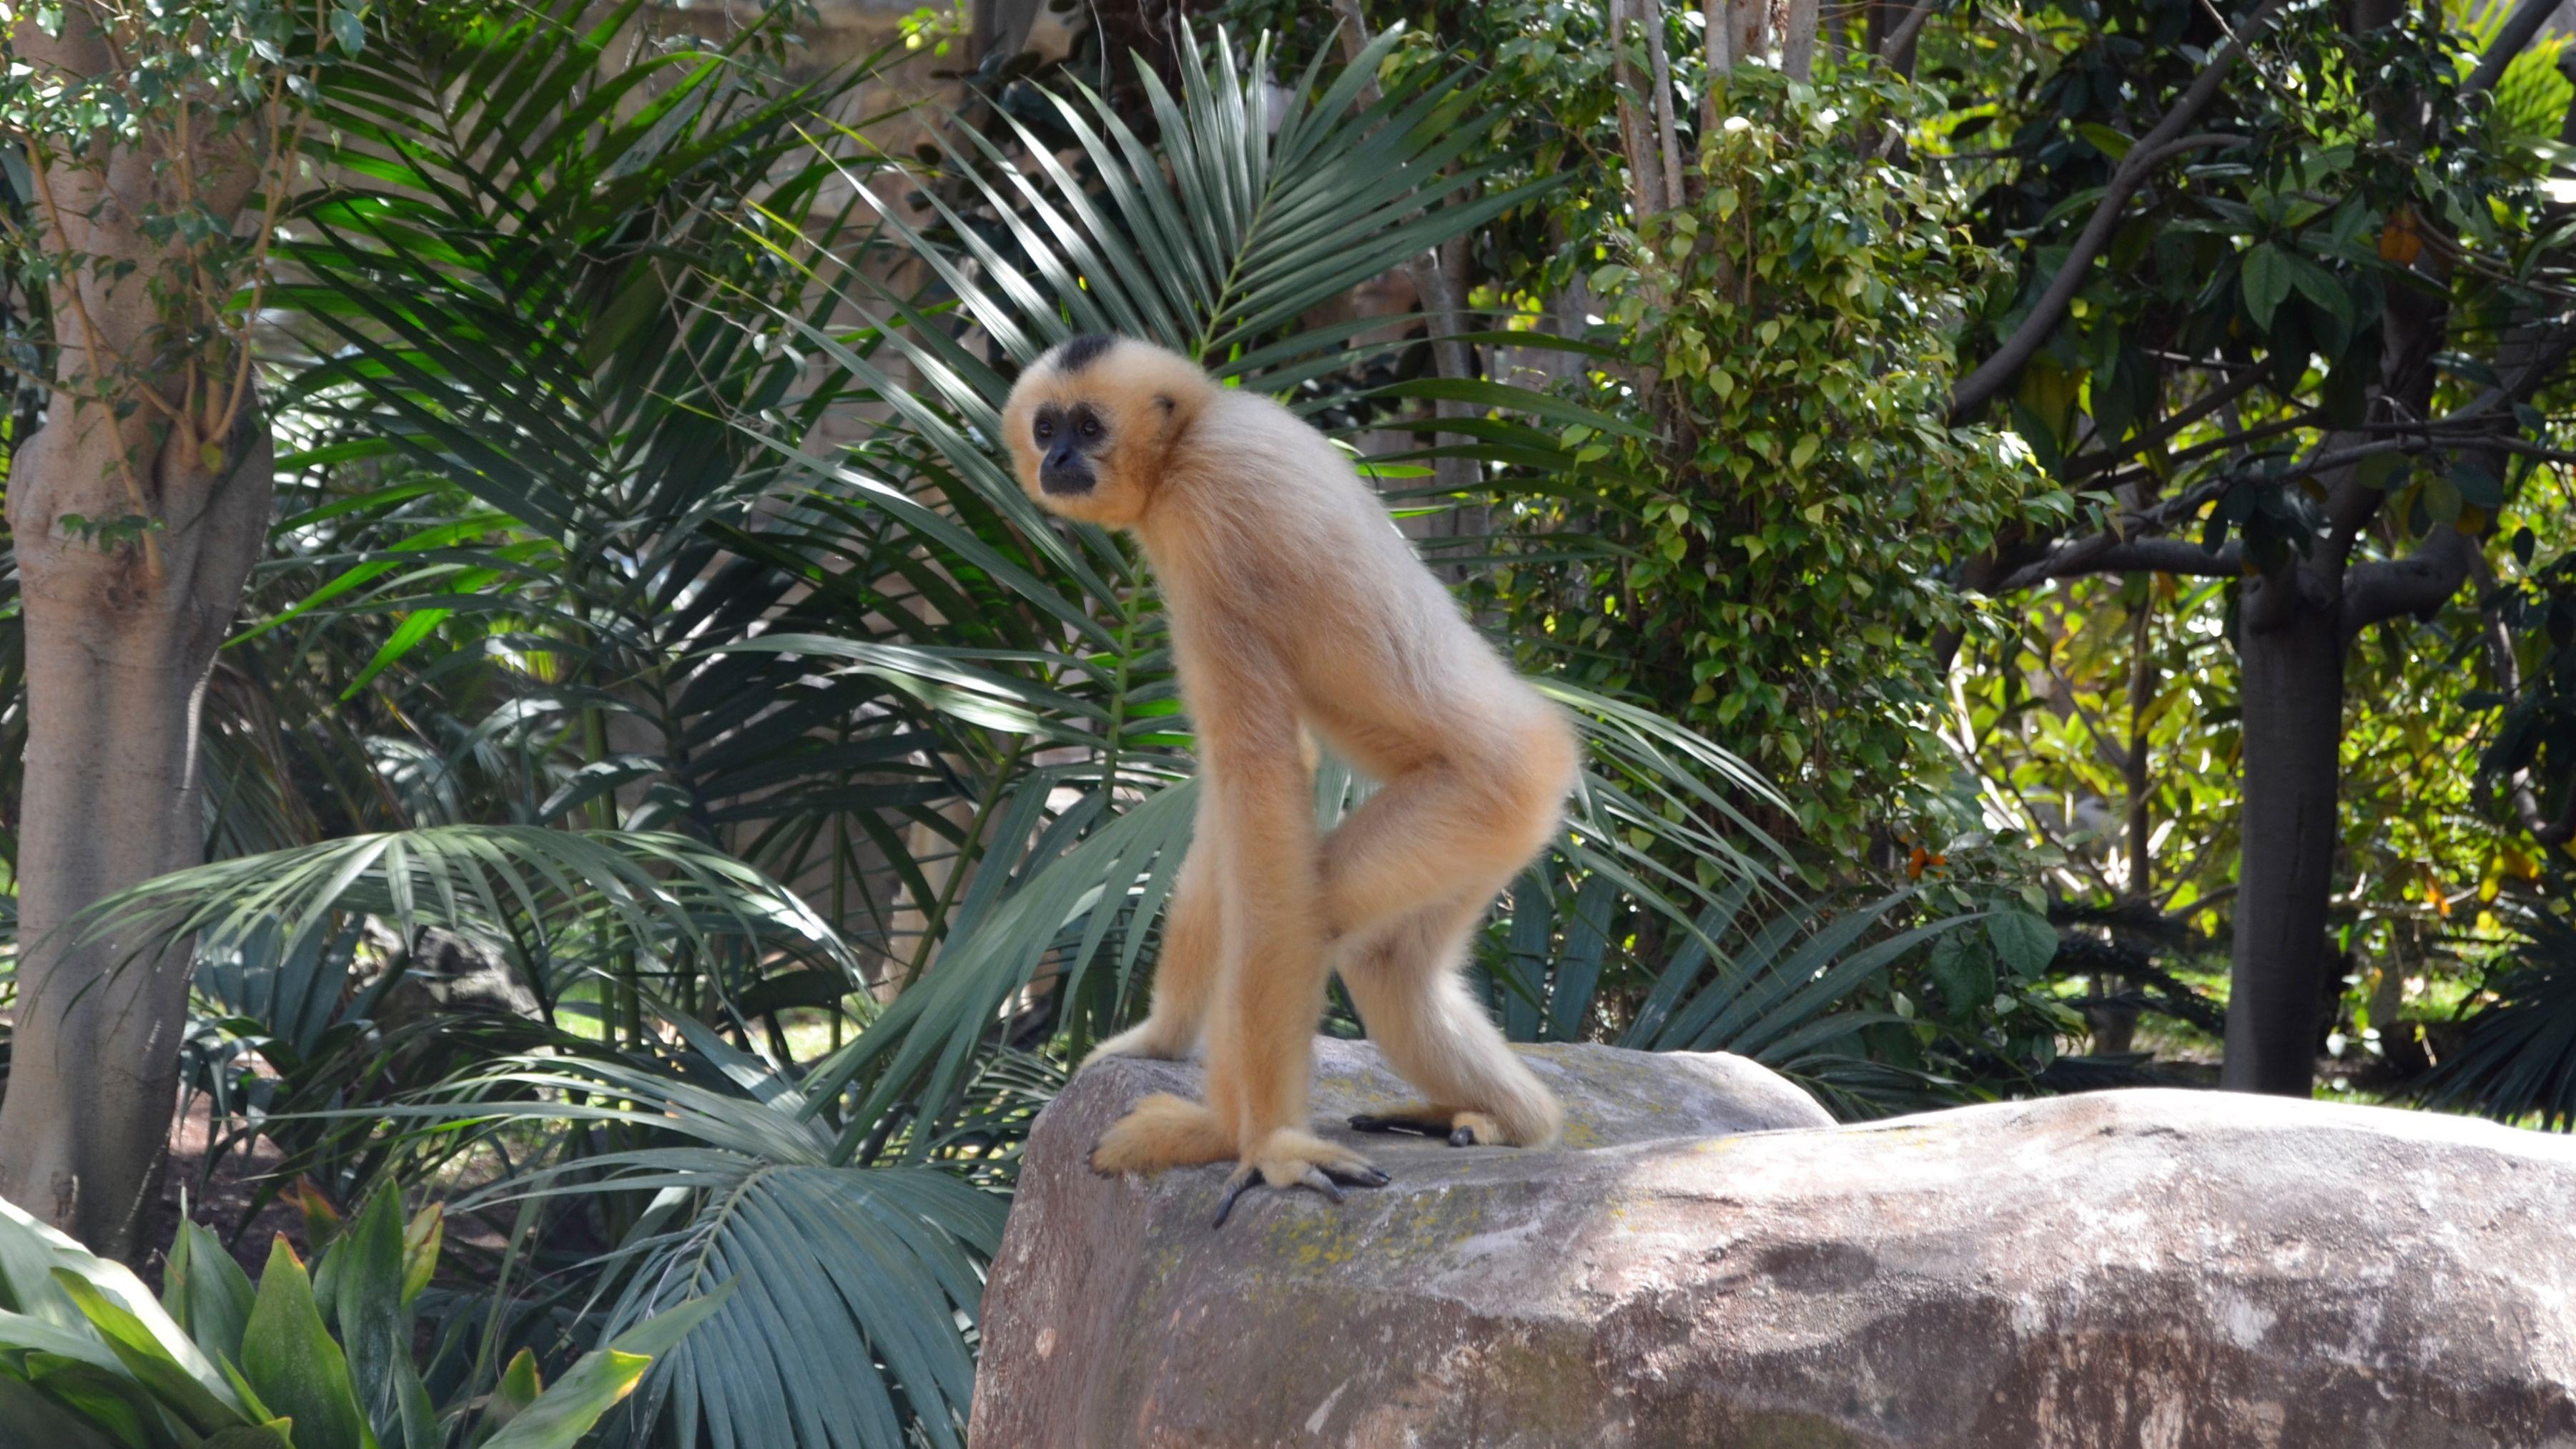 A fuzzy monkey stands on a rock near ferns in Bioparc Fuengirola in Malaga